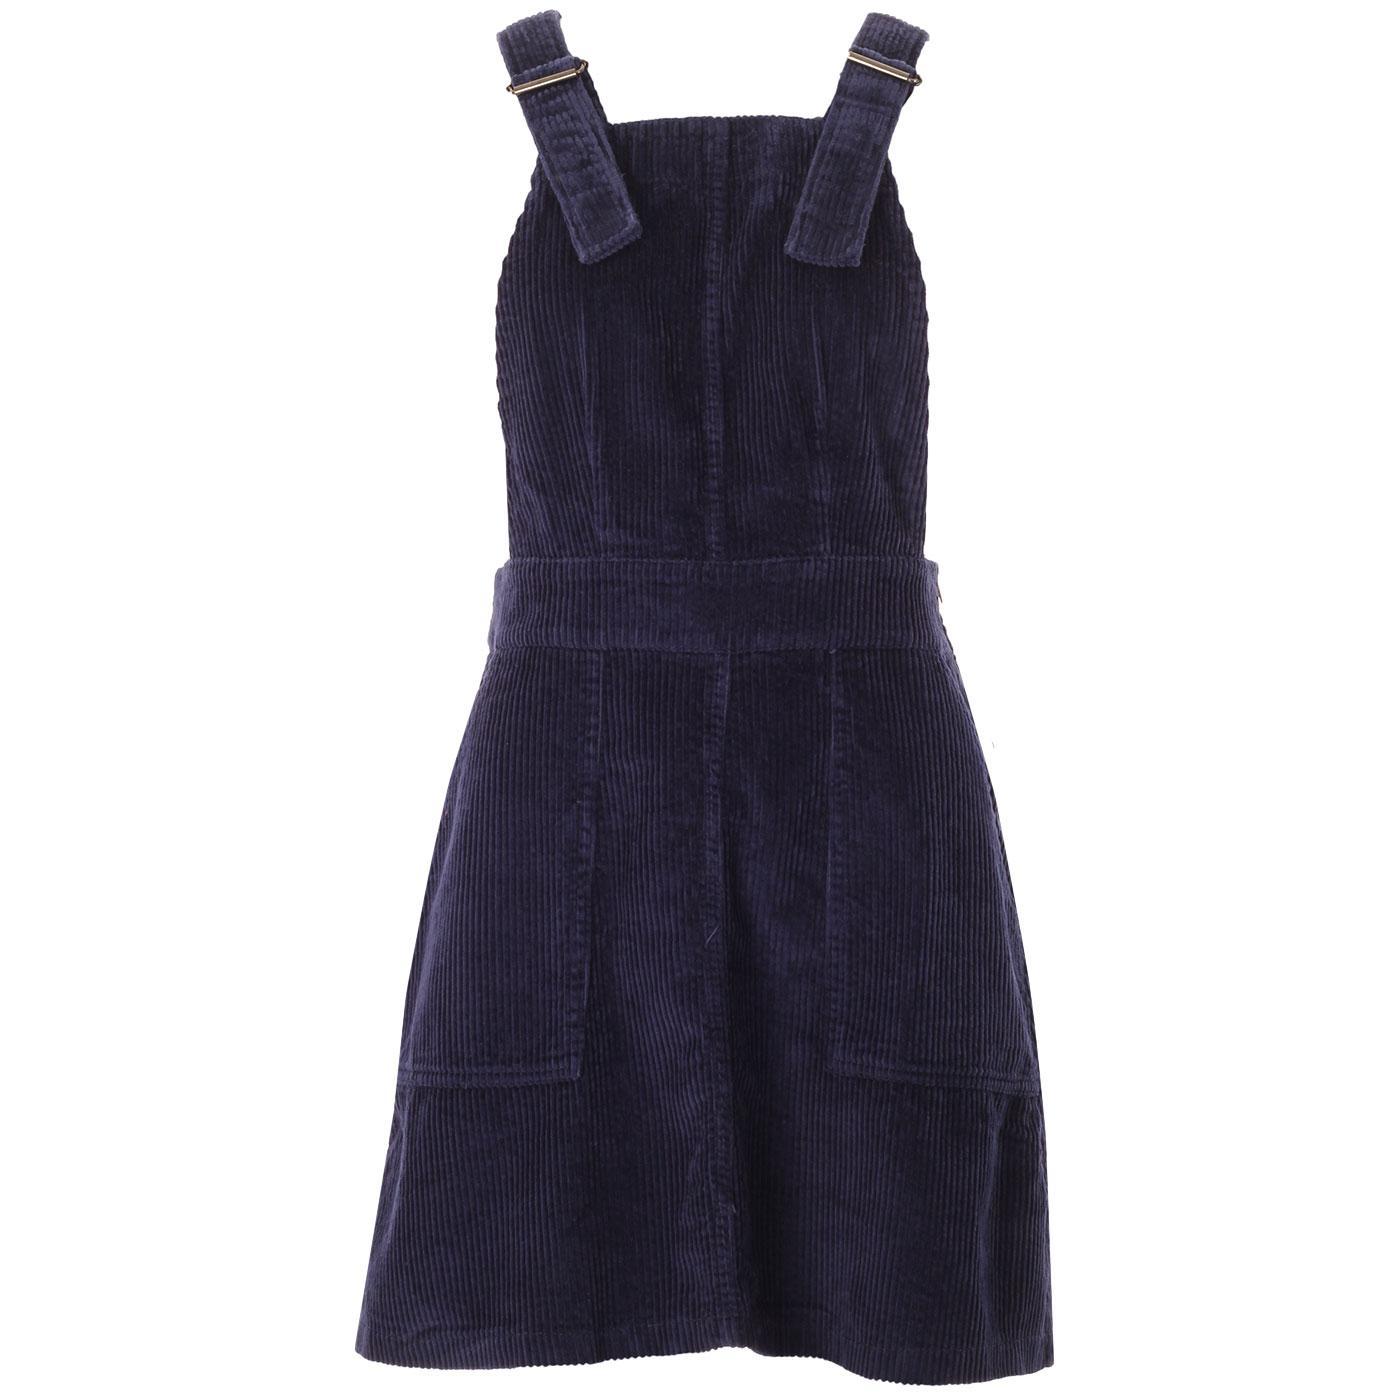 Marlo MADCAP ENGLAND 1960s Cord Pinafore Dress (N)